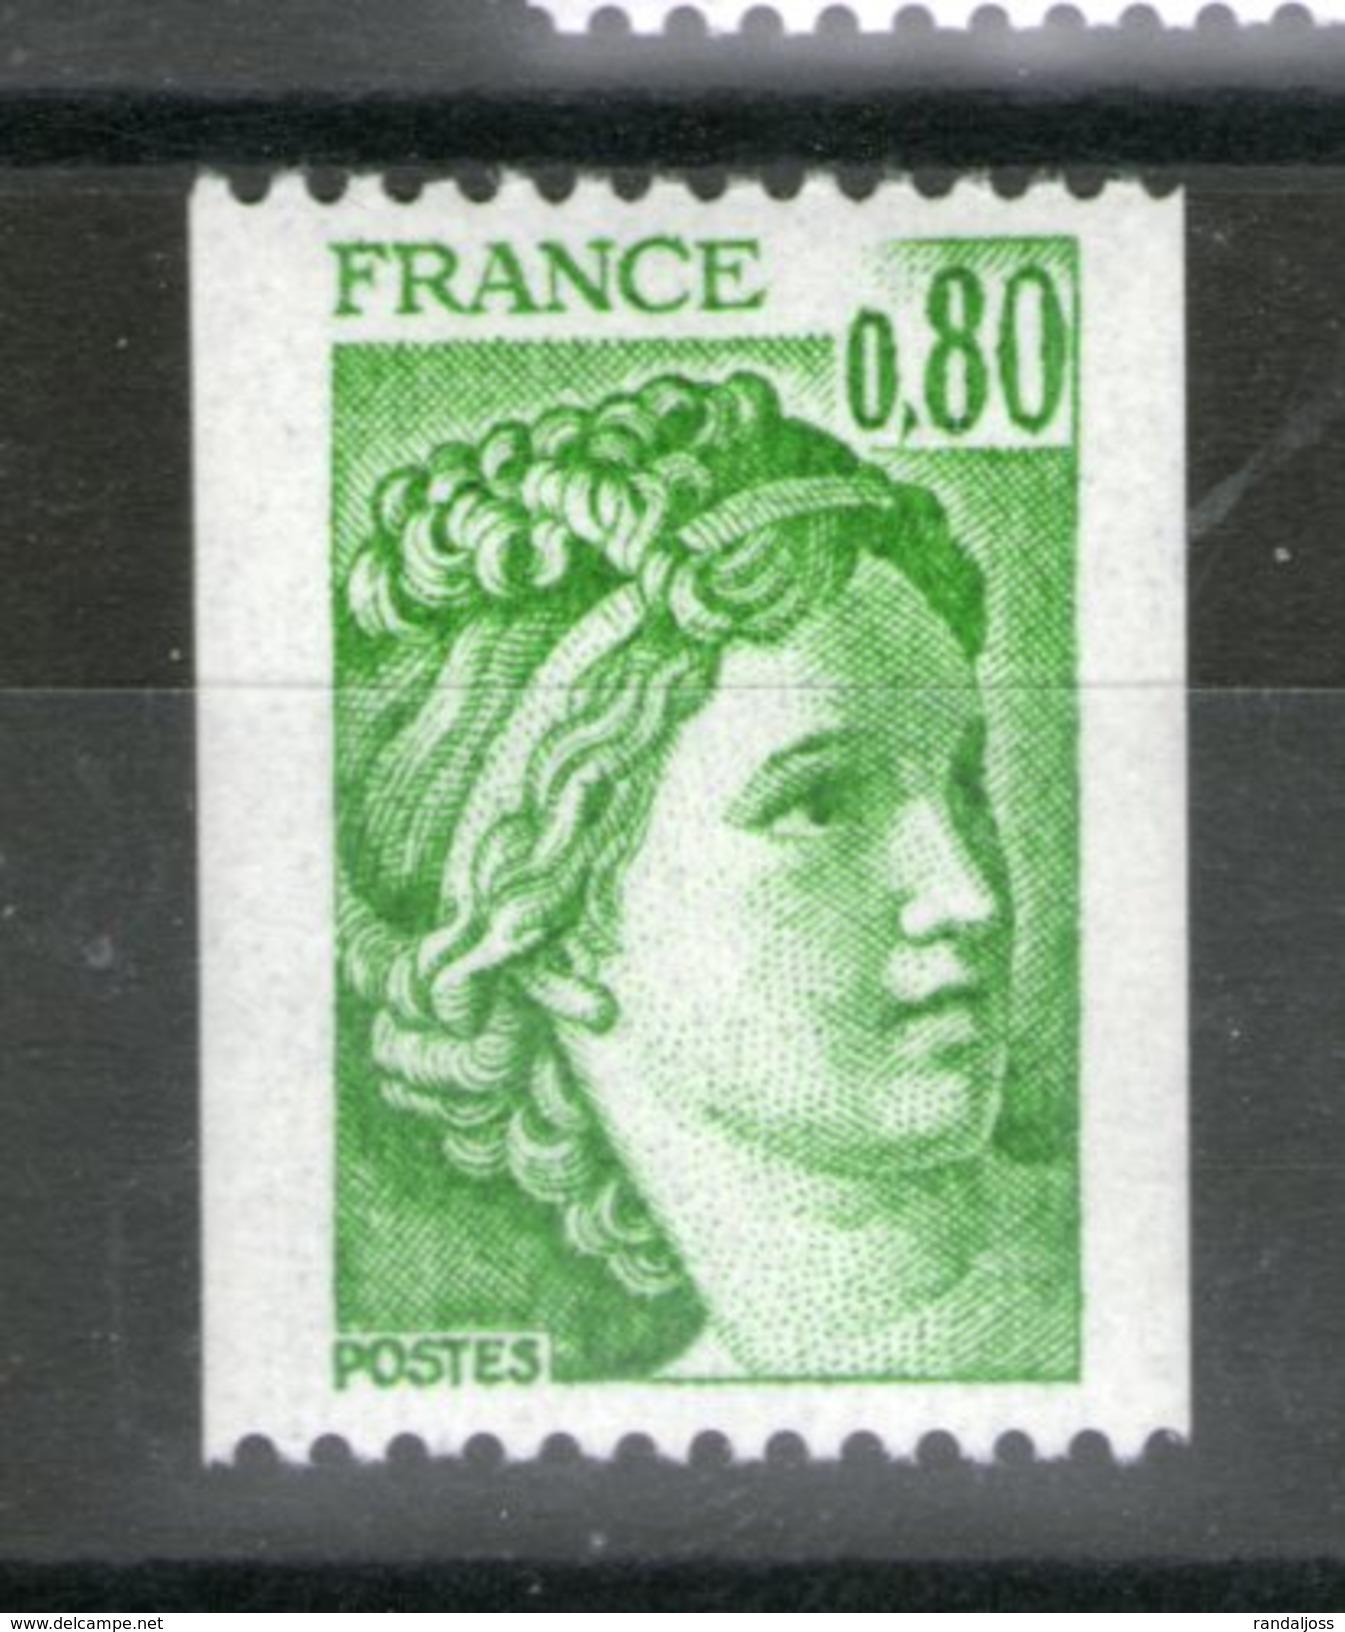 N° 1980**_Sabine 0.80 Vert_cote 1.60 - Francobolli In Bobina